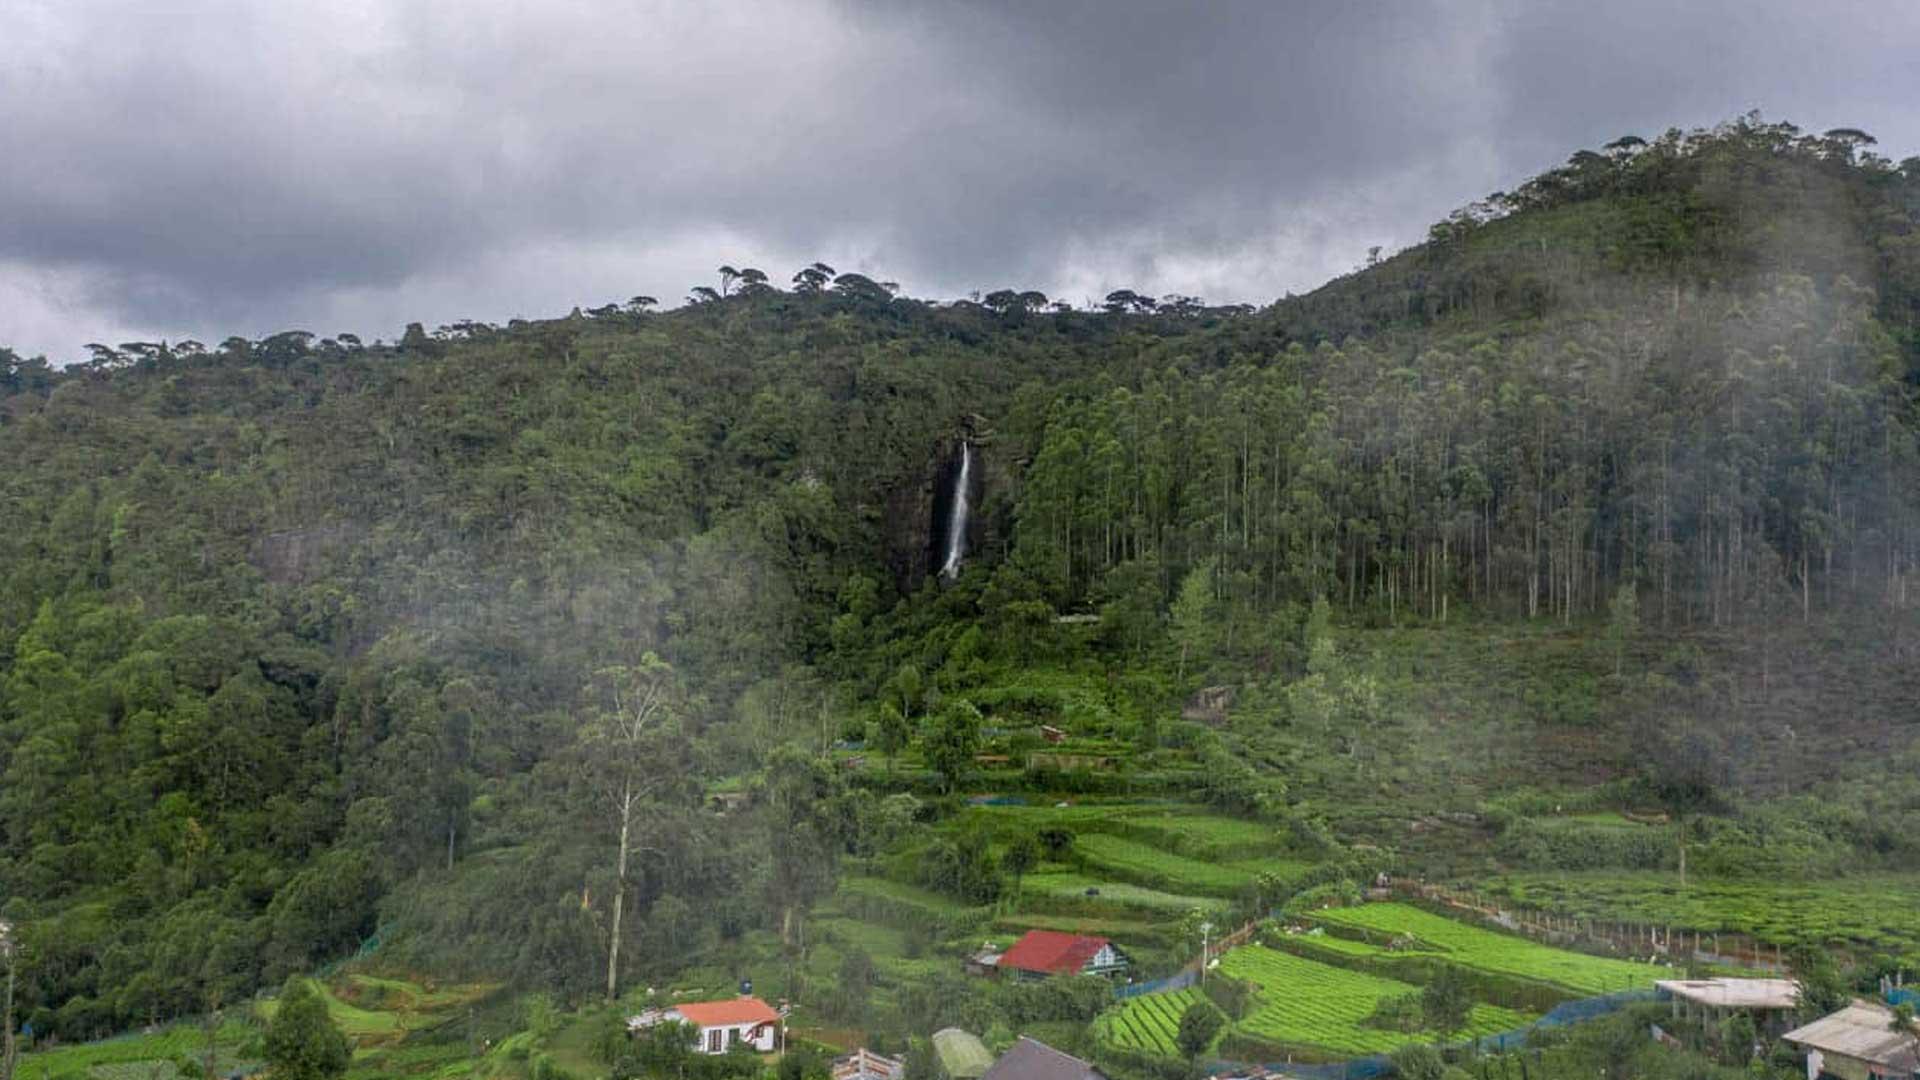 The Golden Ridge - Lovers leap waterfall